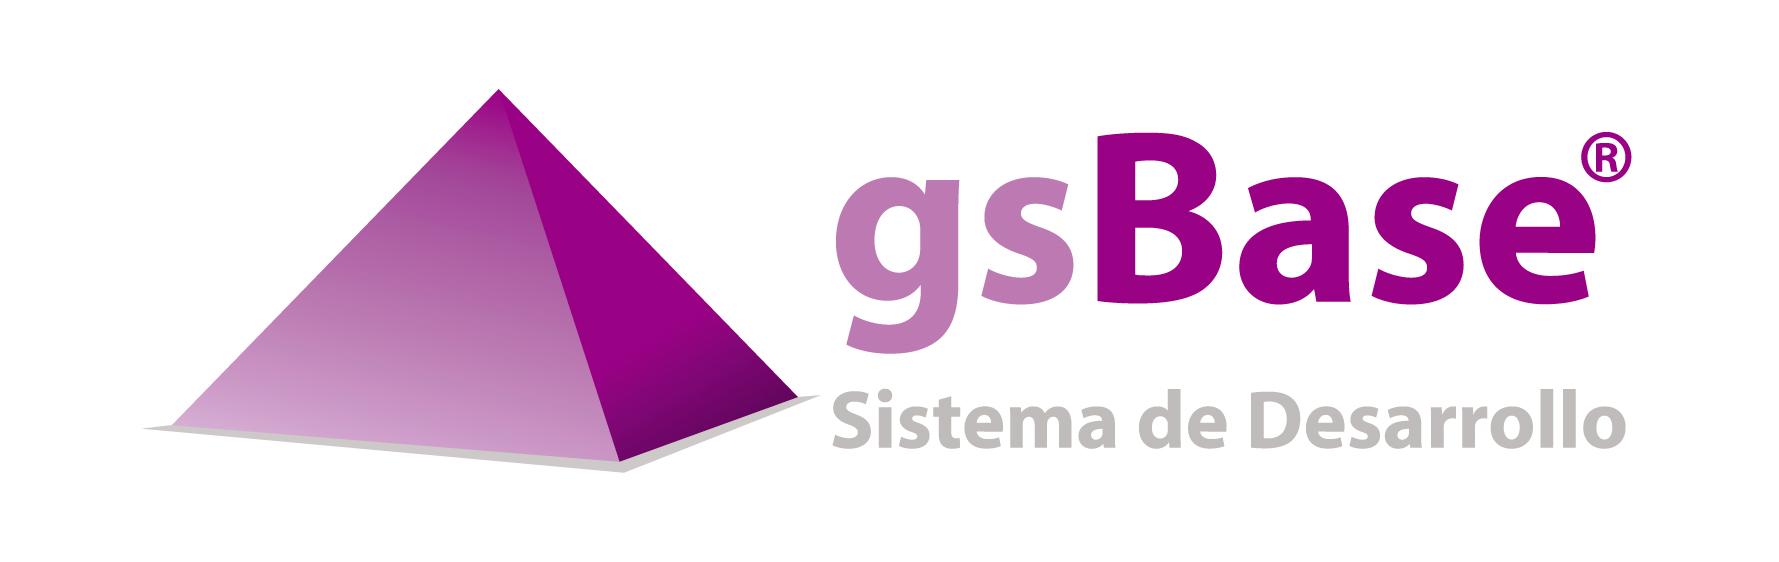 gsbase